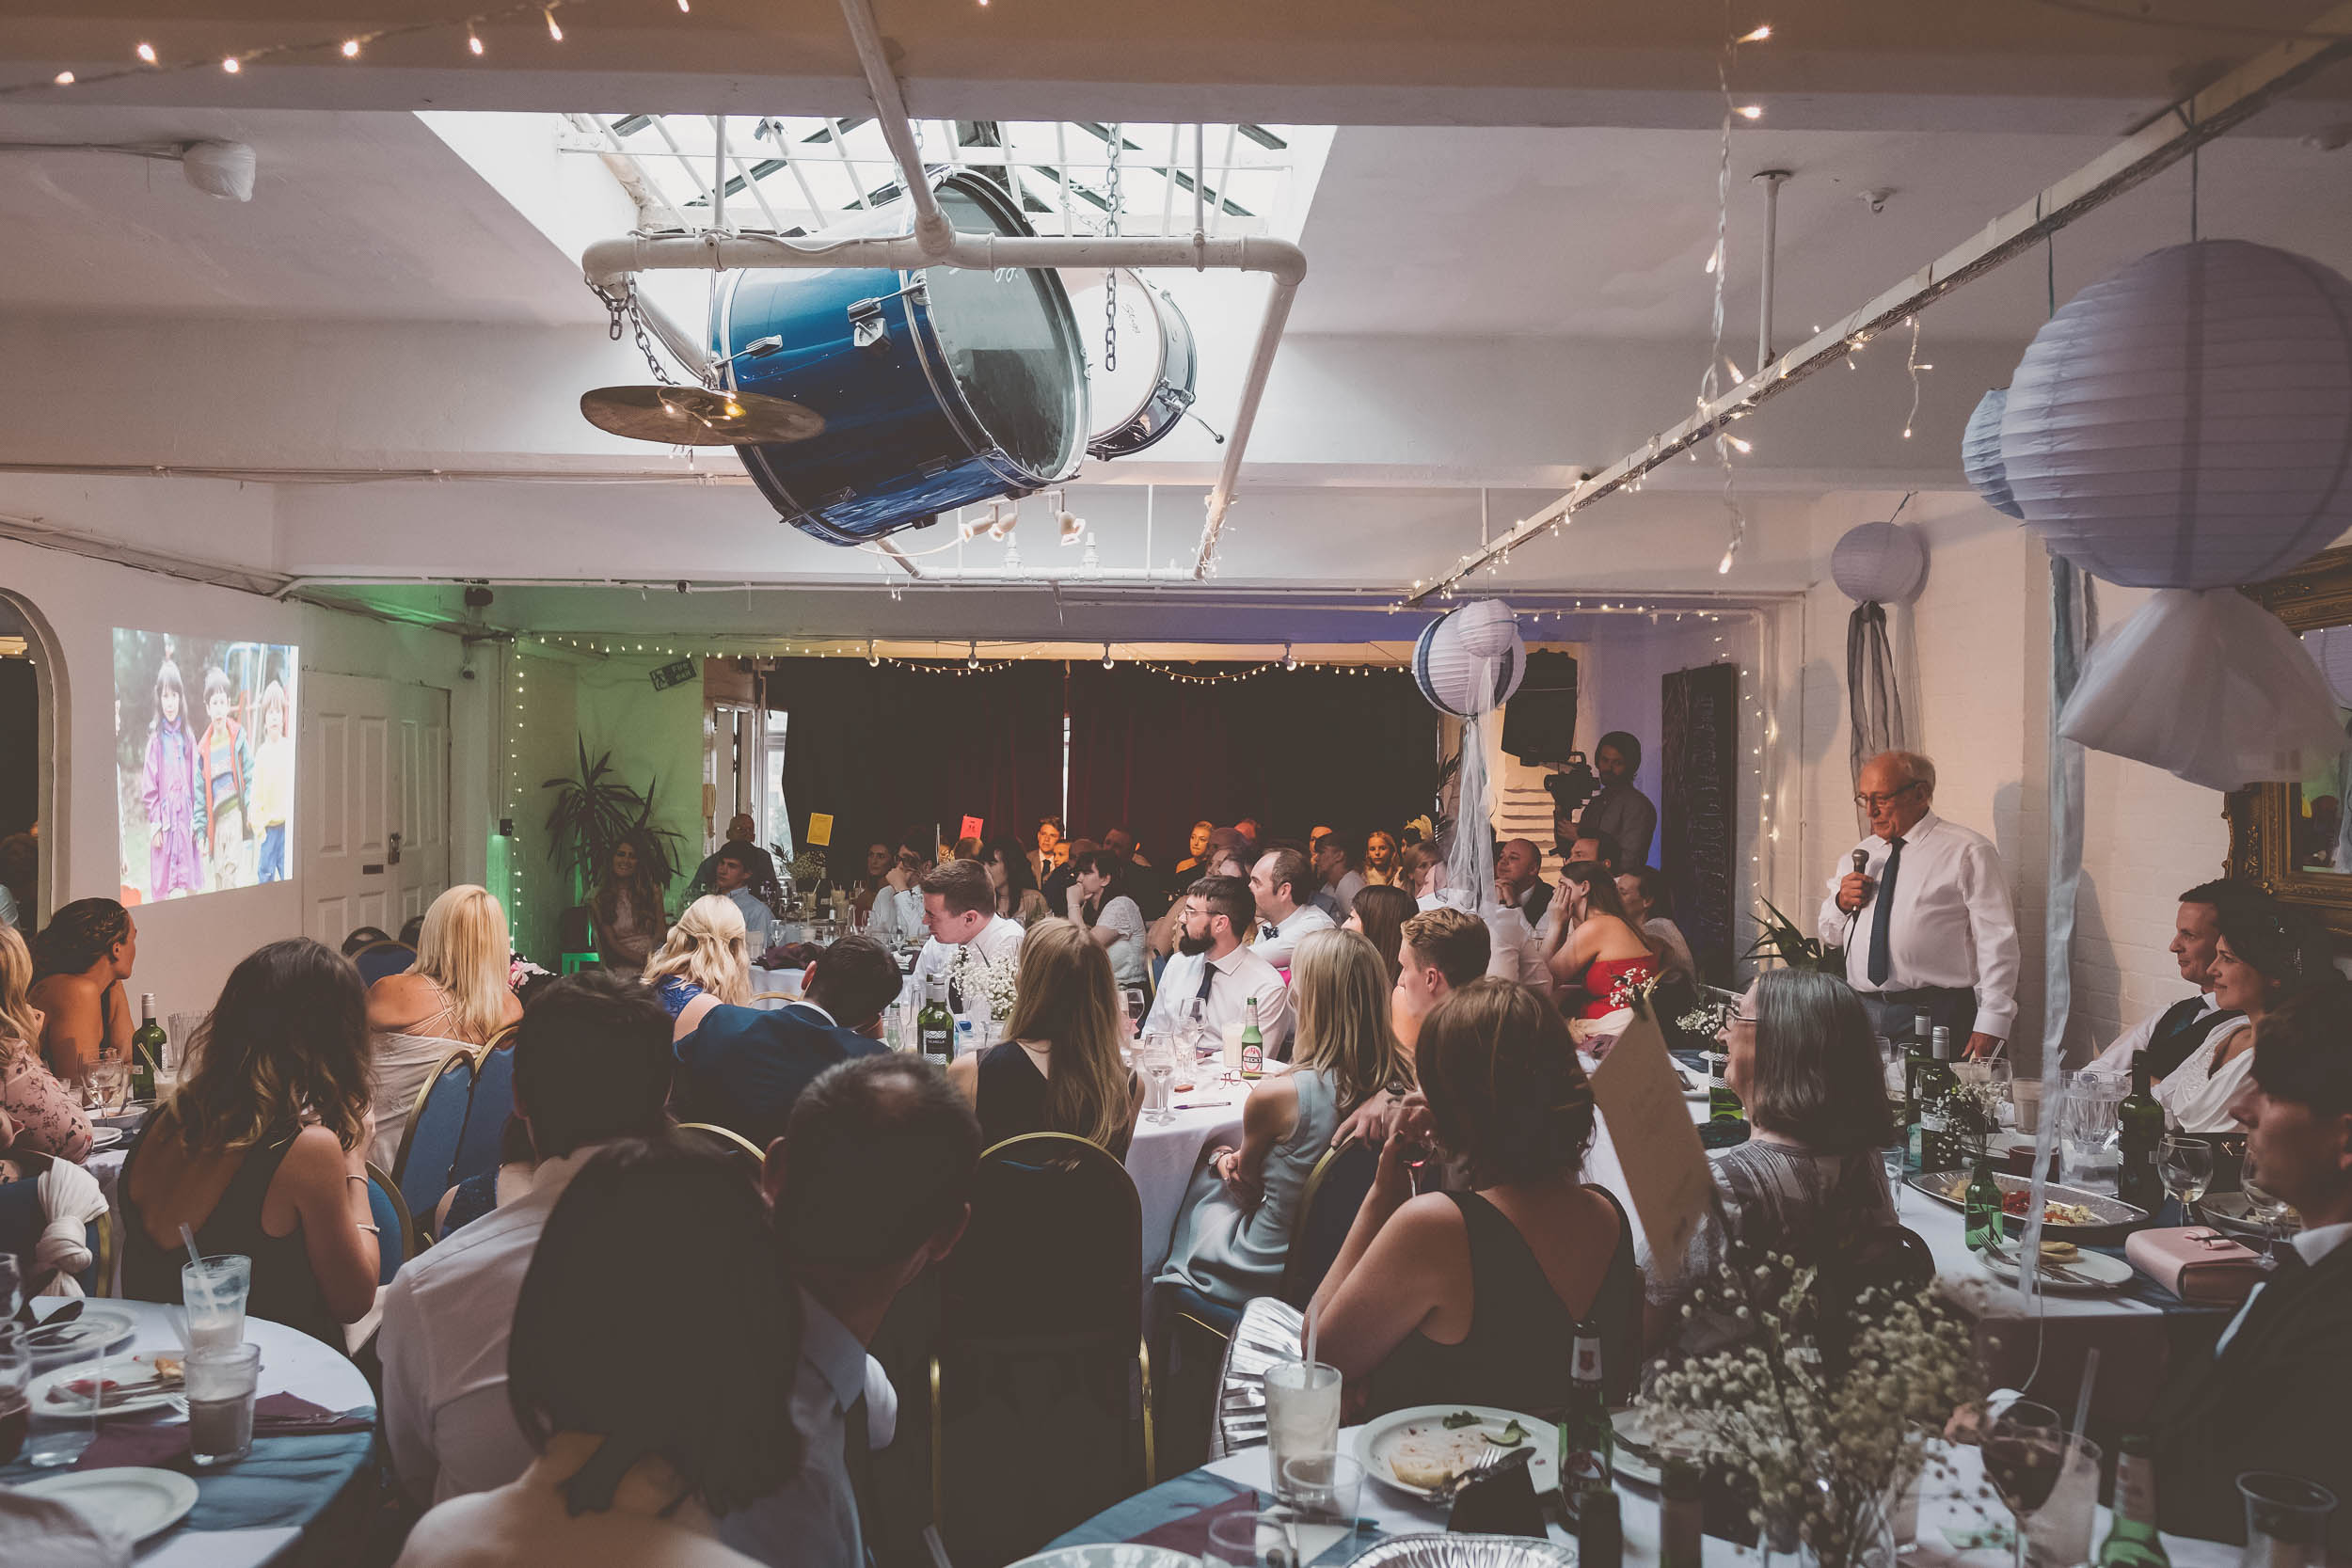 islington-town-hall-4th-floor-studios-wedding357.jpg